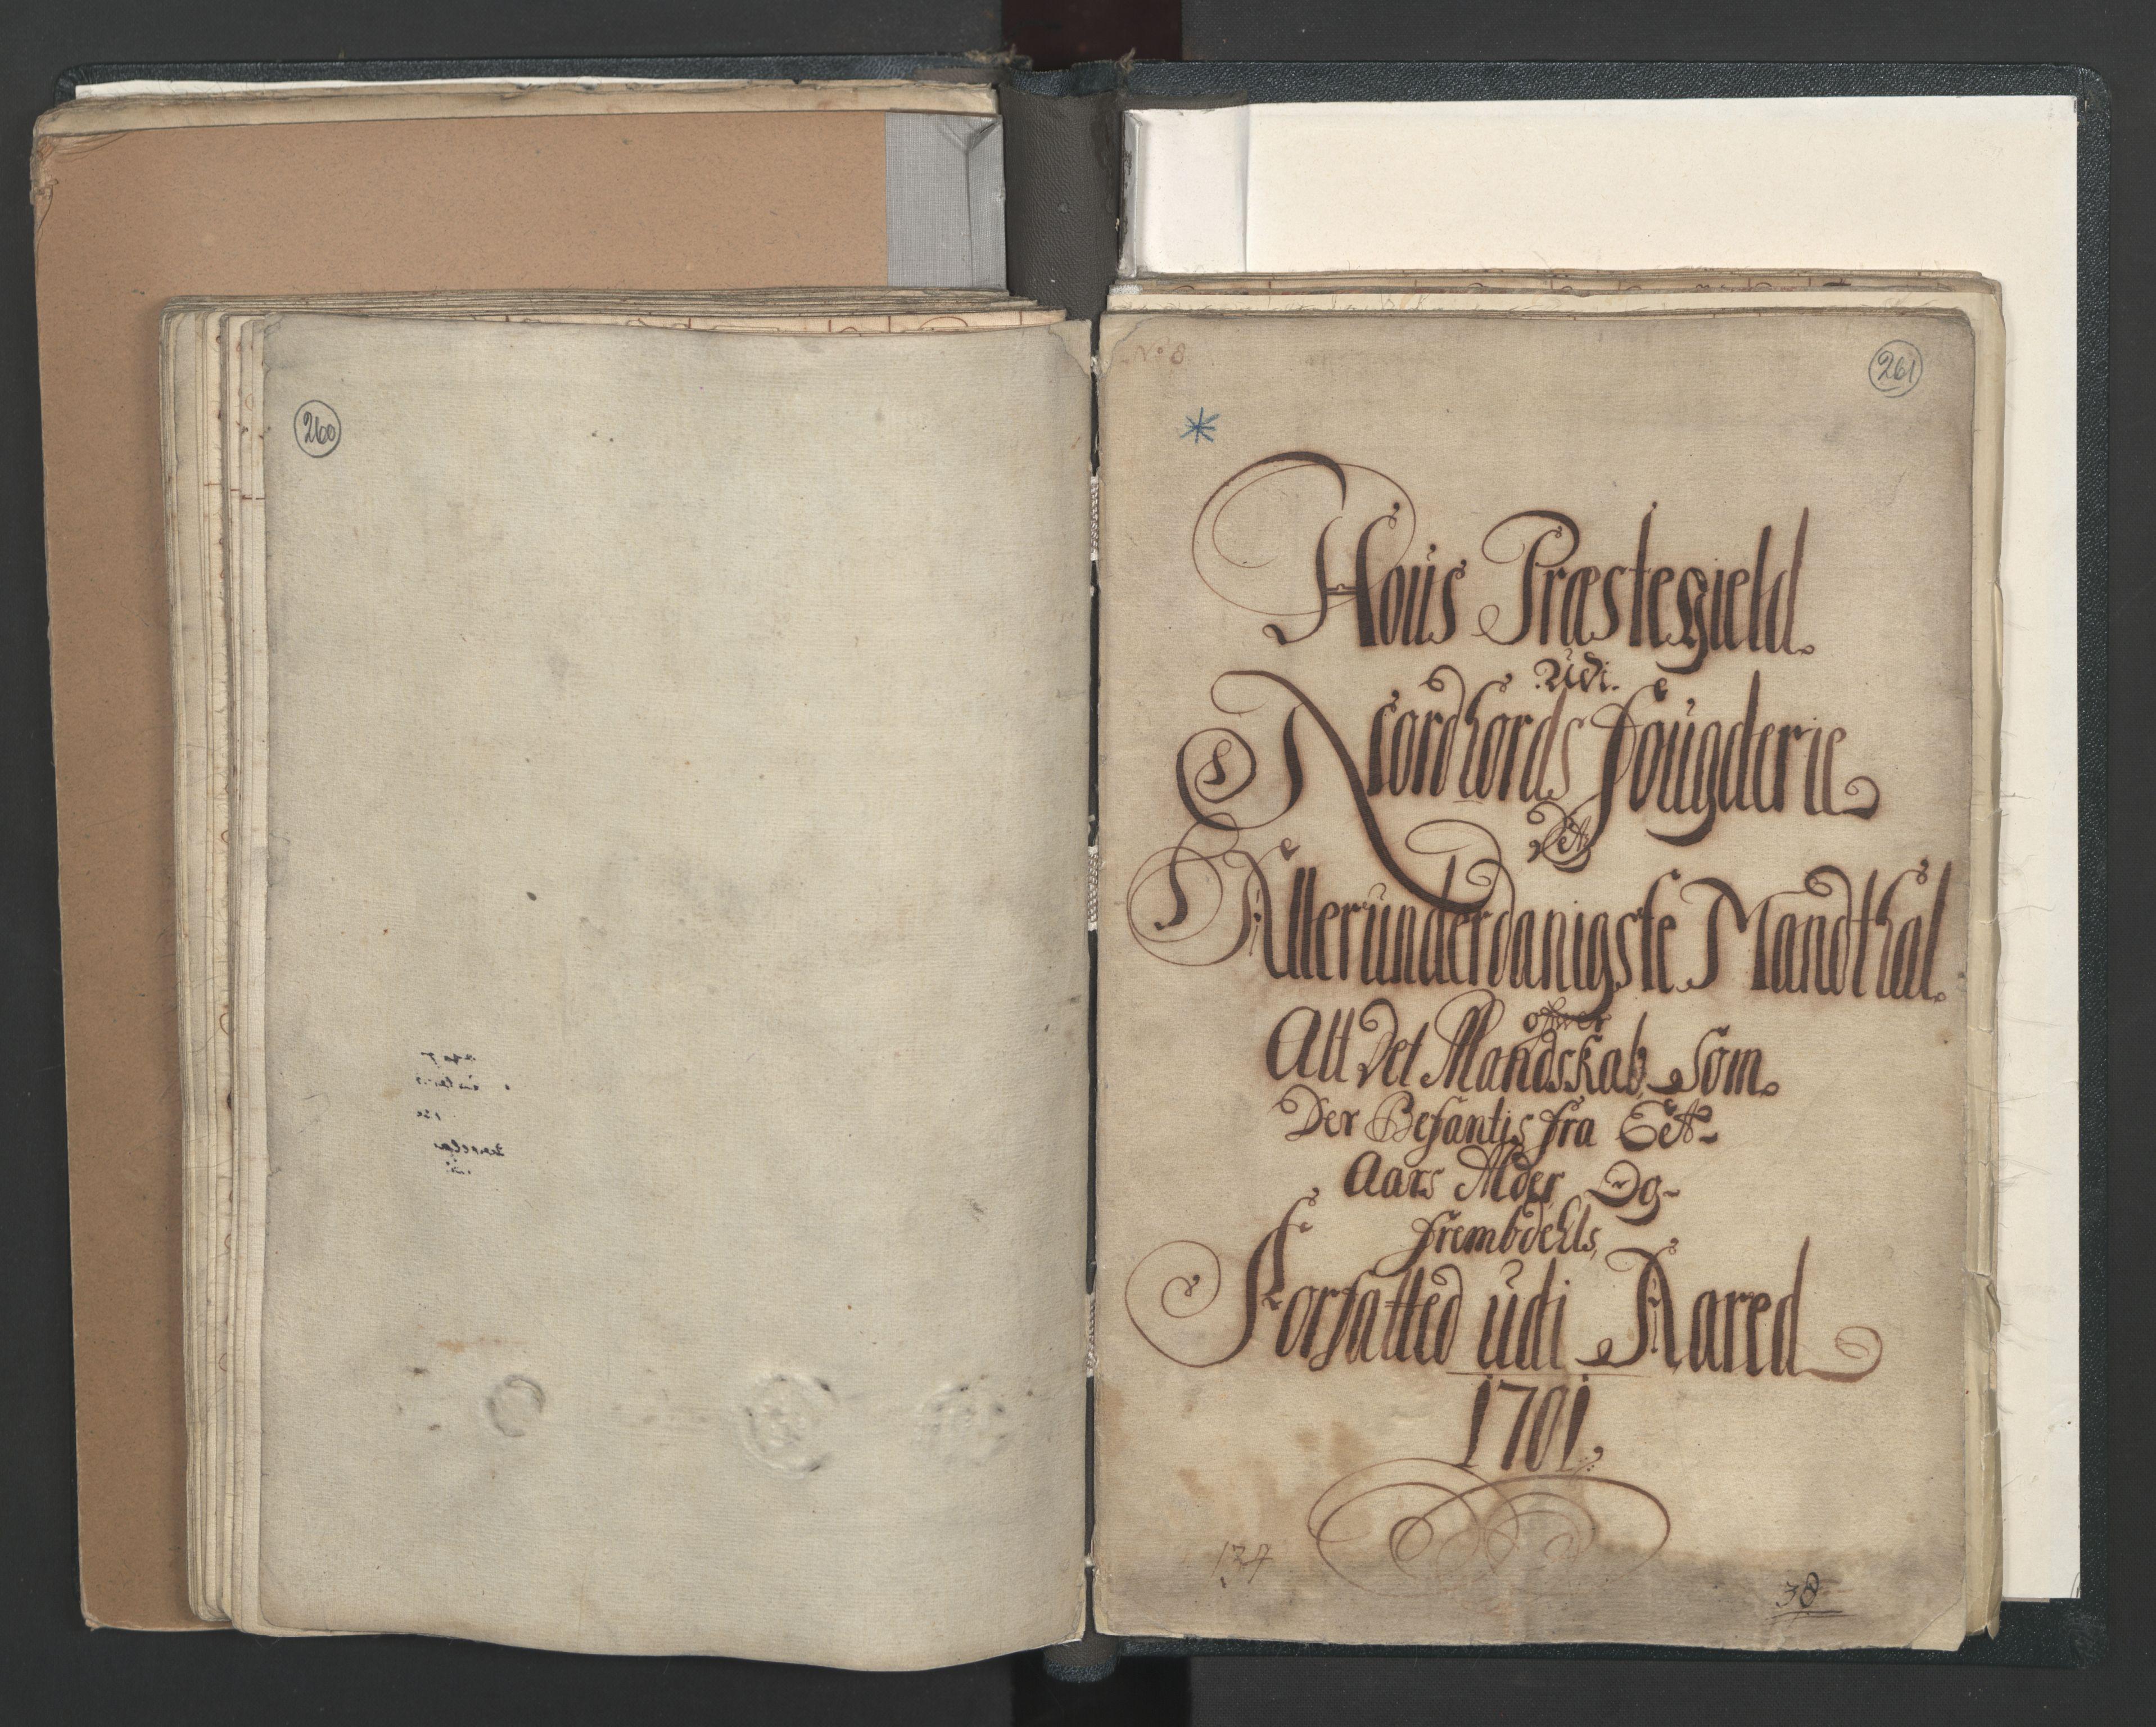 RA, Manntallet 1701, nr. 7: Nordhordland og Voss fogderi, 1701, s. 260-261